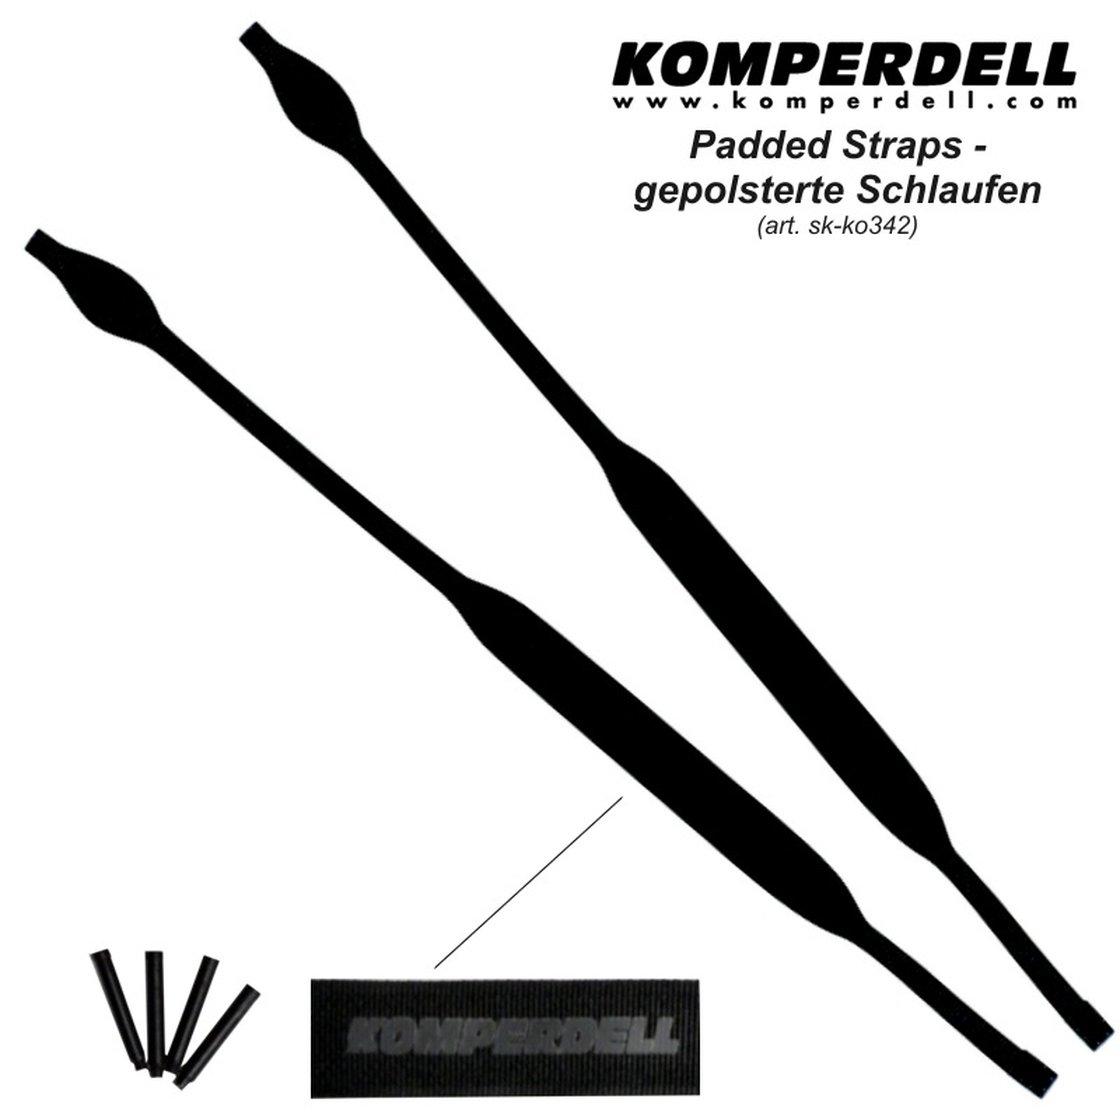 komperdell-padded-strap-gepolsterte-schlaufe_parnazott_csuklopant_csere.jpg